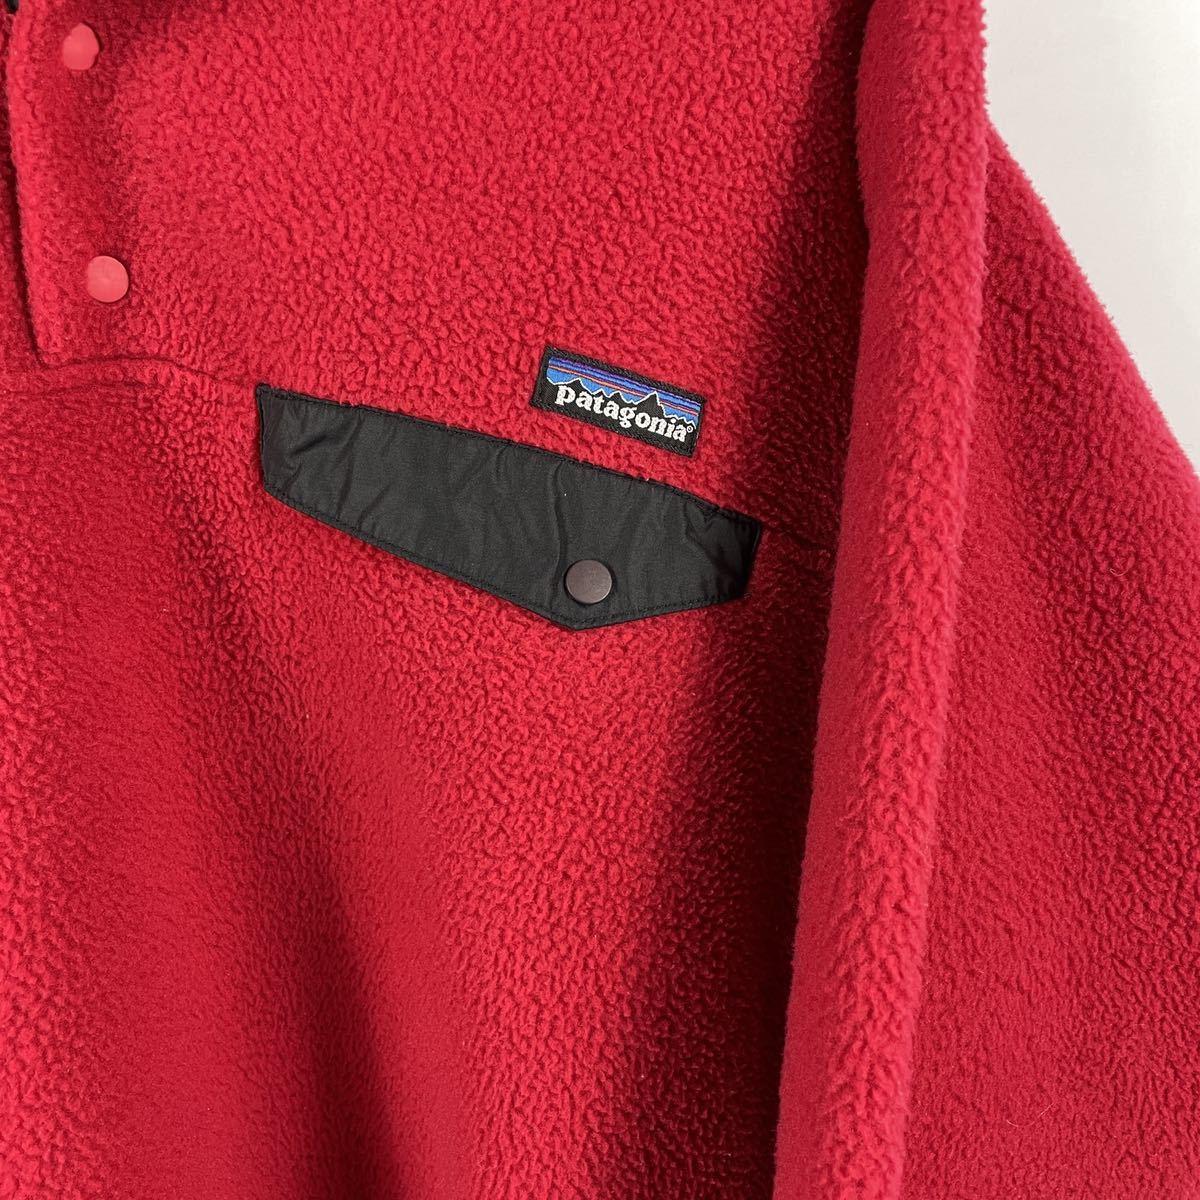 【USA製】2000年製パタゴニア スナップT シンチラ ハーフボタン フリース フリースジャケット patagonia